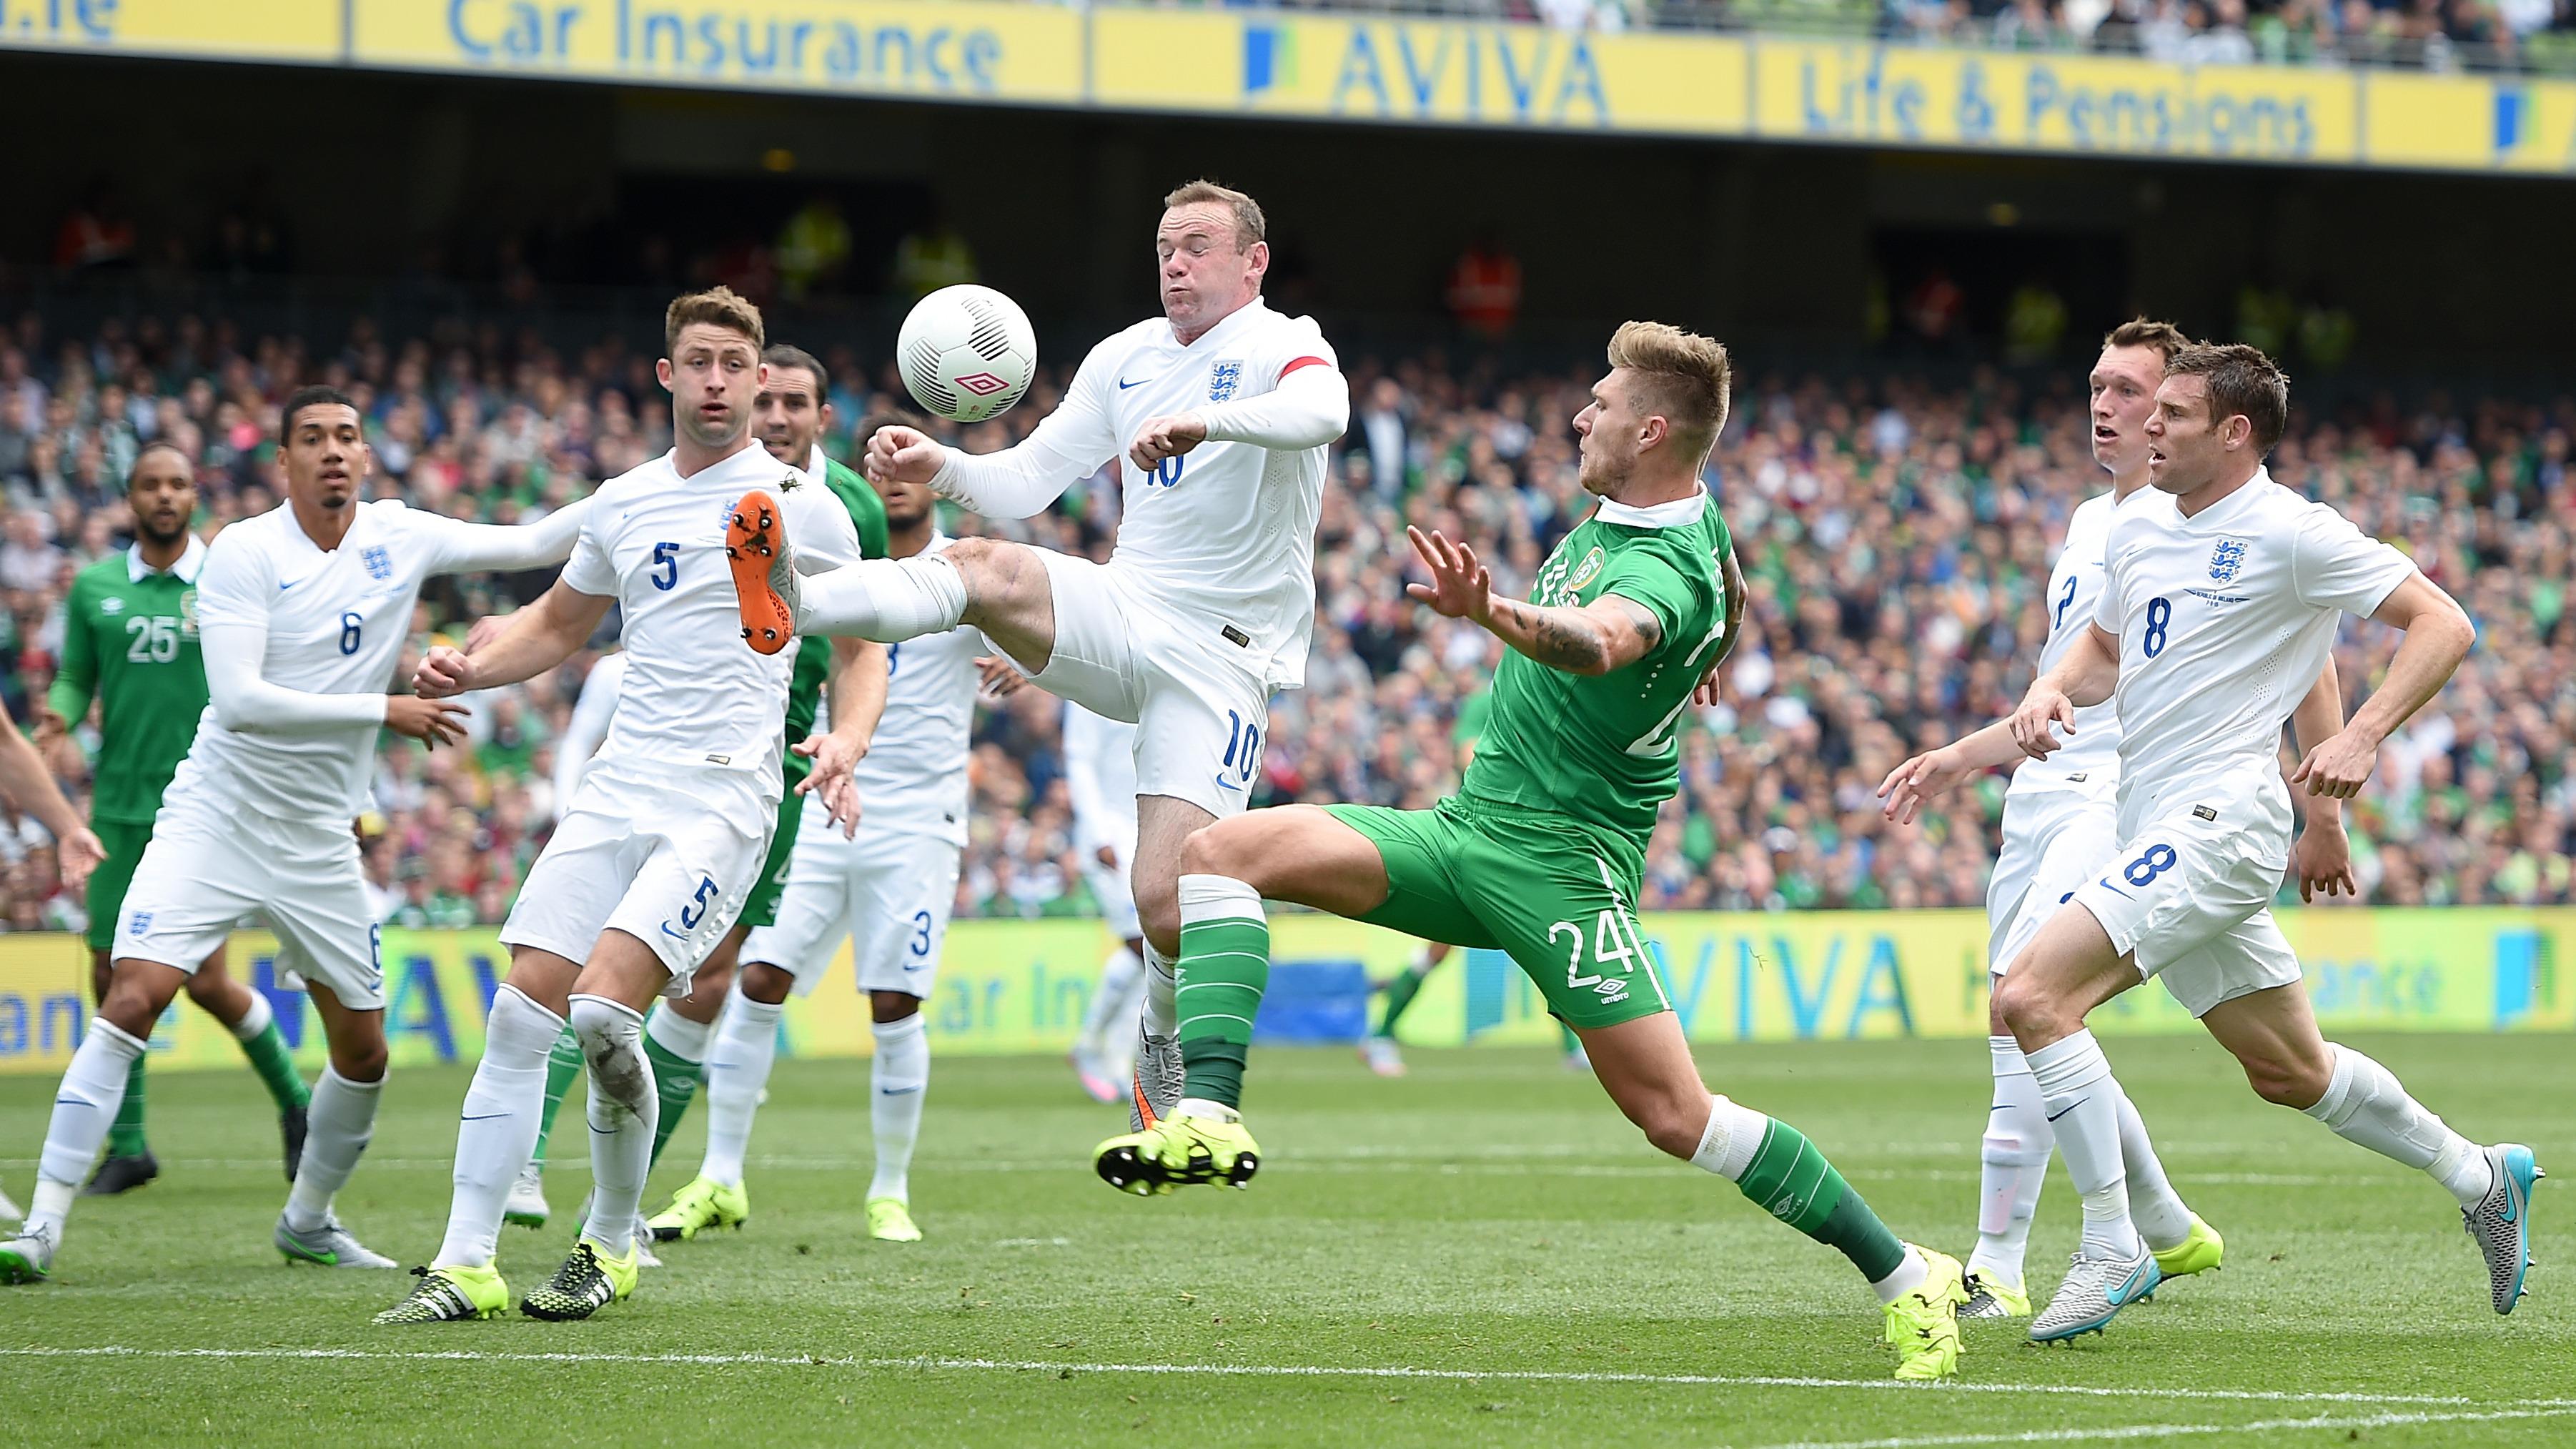 Watch England host Republic of Ireland in friendly live on ITV | ITV Football